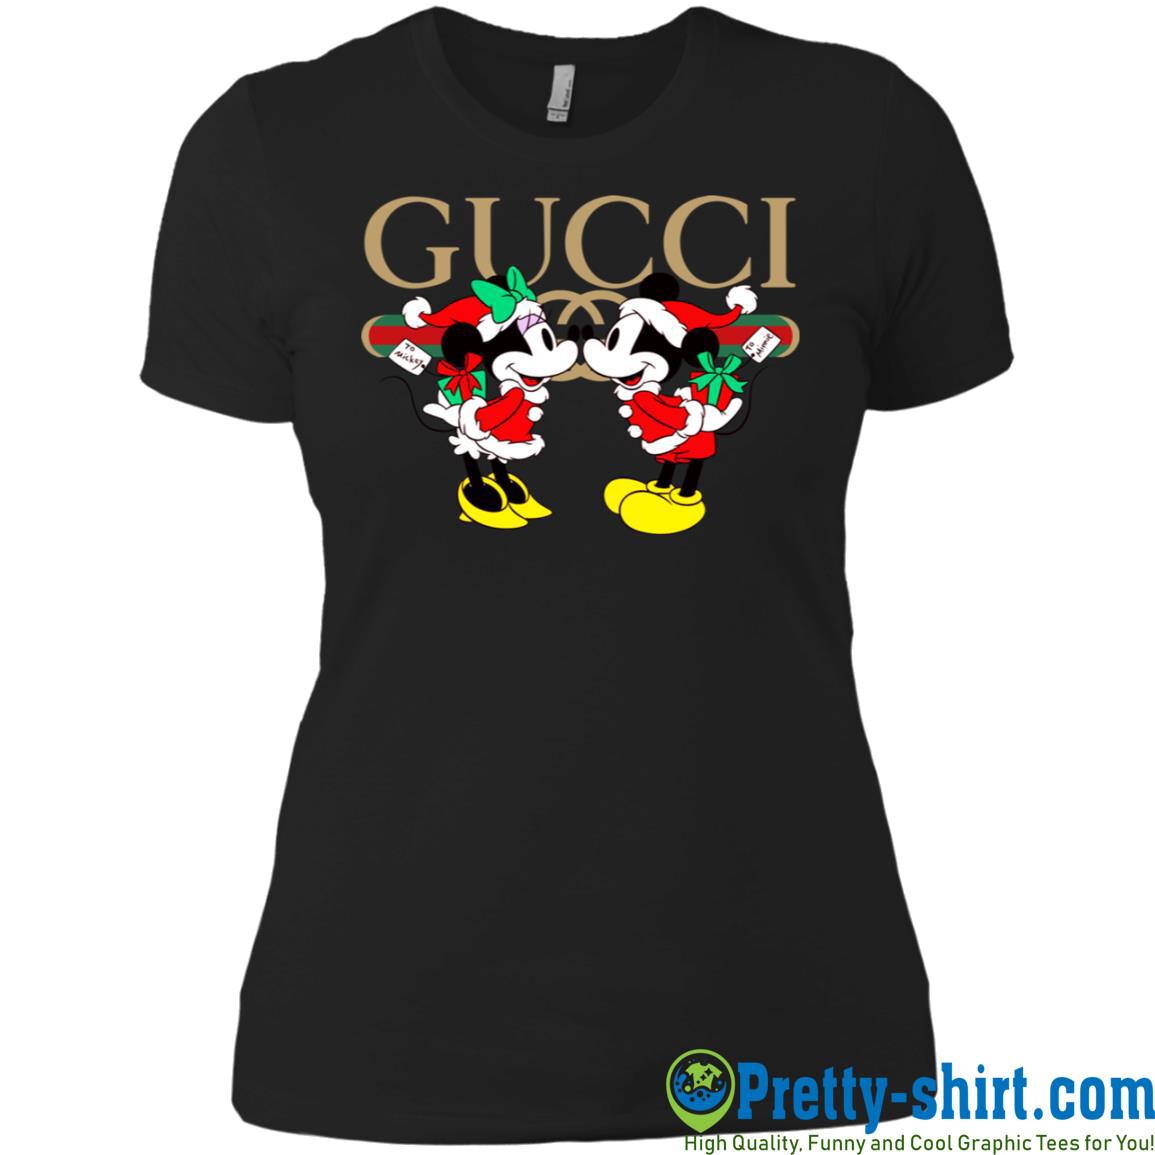 Gucci x Disney Mickey Christmas Pullover Hoodie, Classic Logo Gucci, Gucci Shirt, Gucci T-shirt, Gucci Logo, Gucci Fashion shirt, Fashion shirt, Gucci Design shirt,Snake Gucci vintage shirt